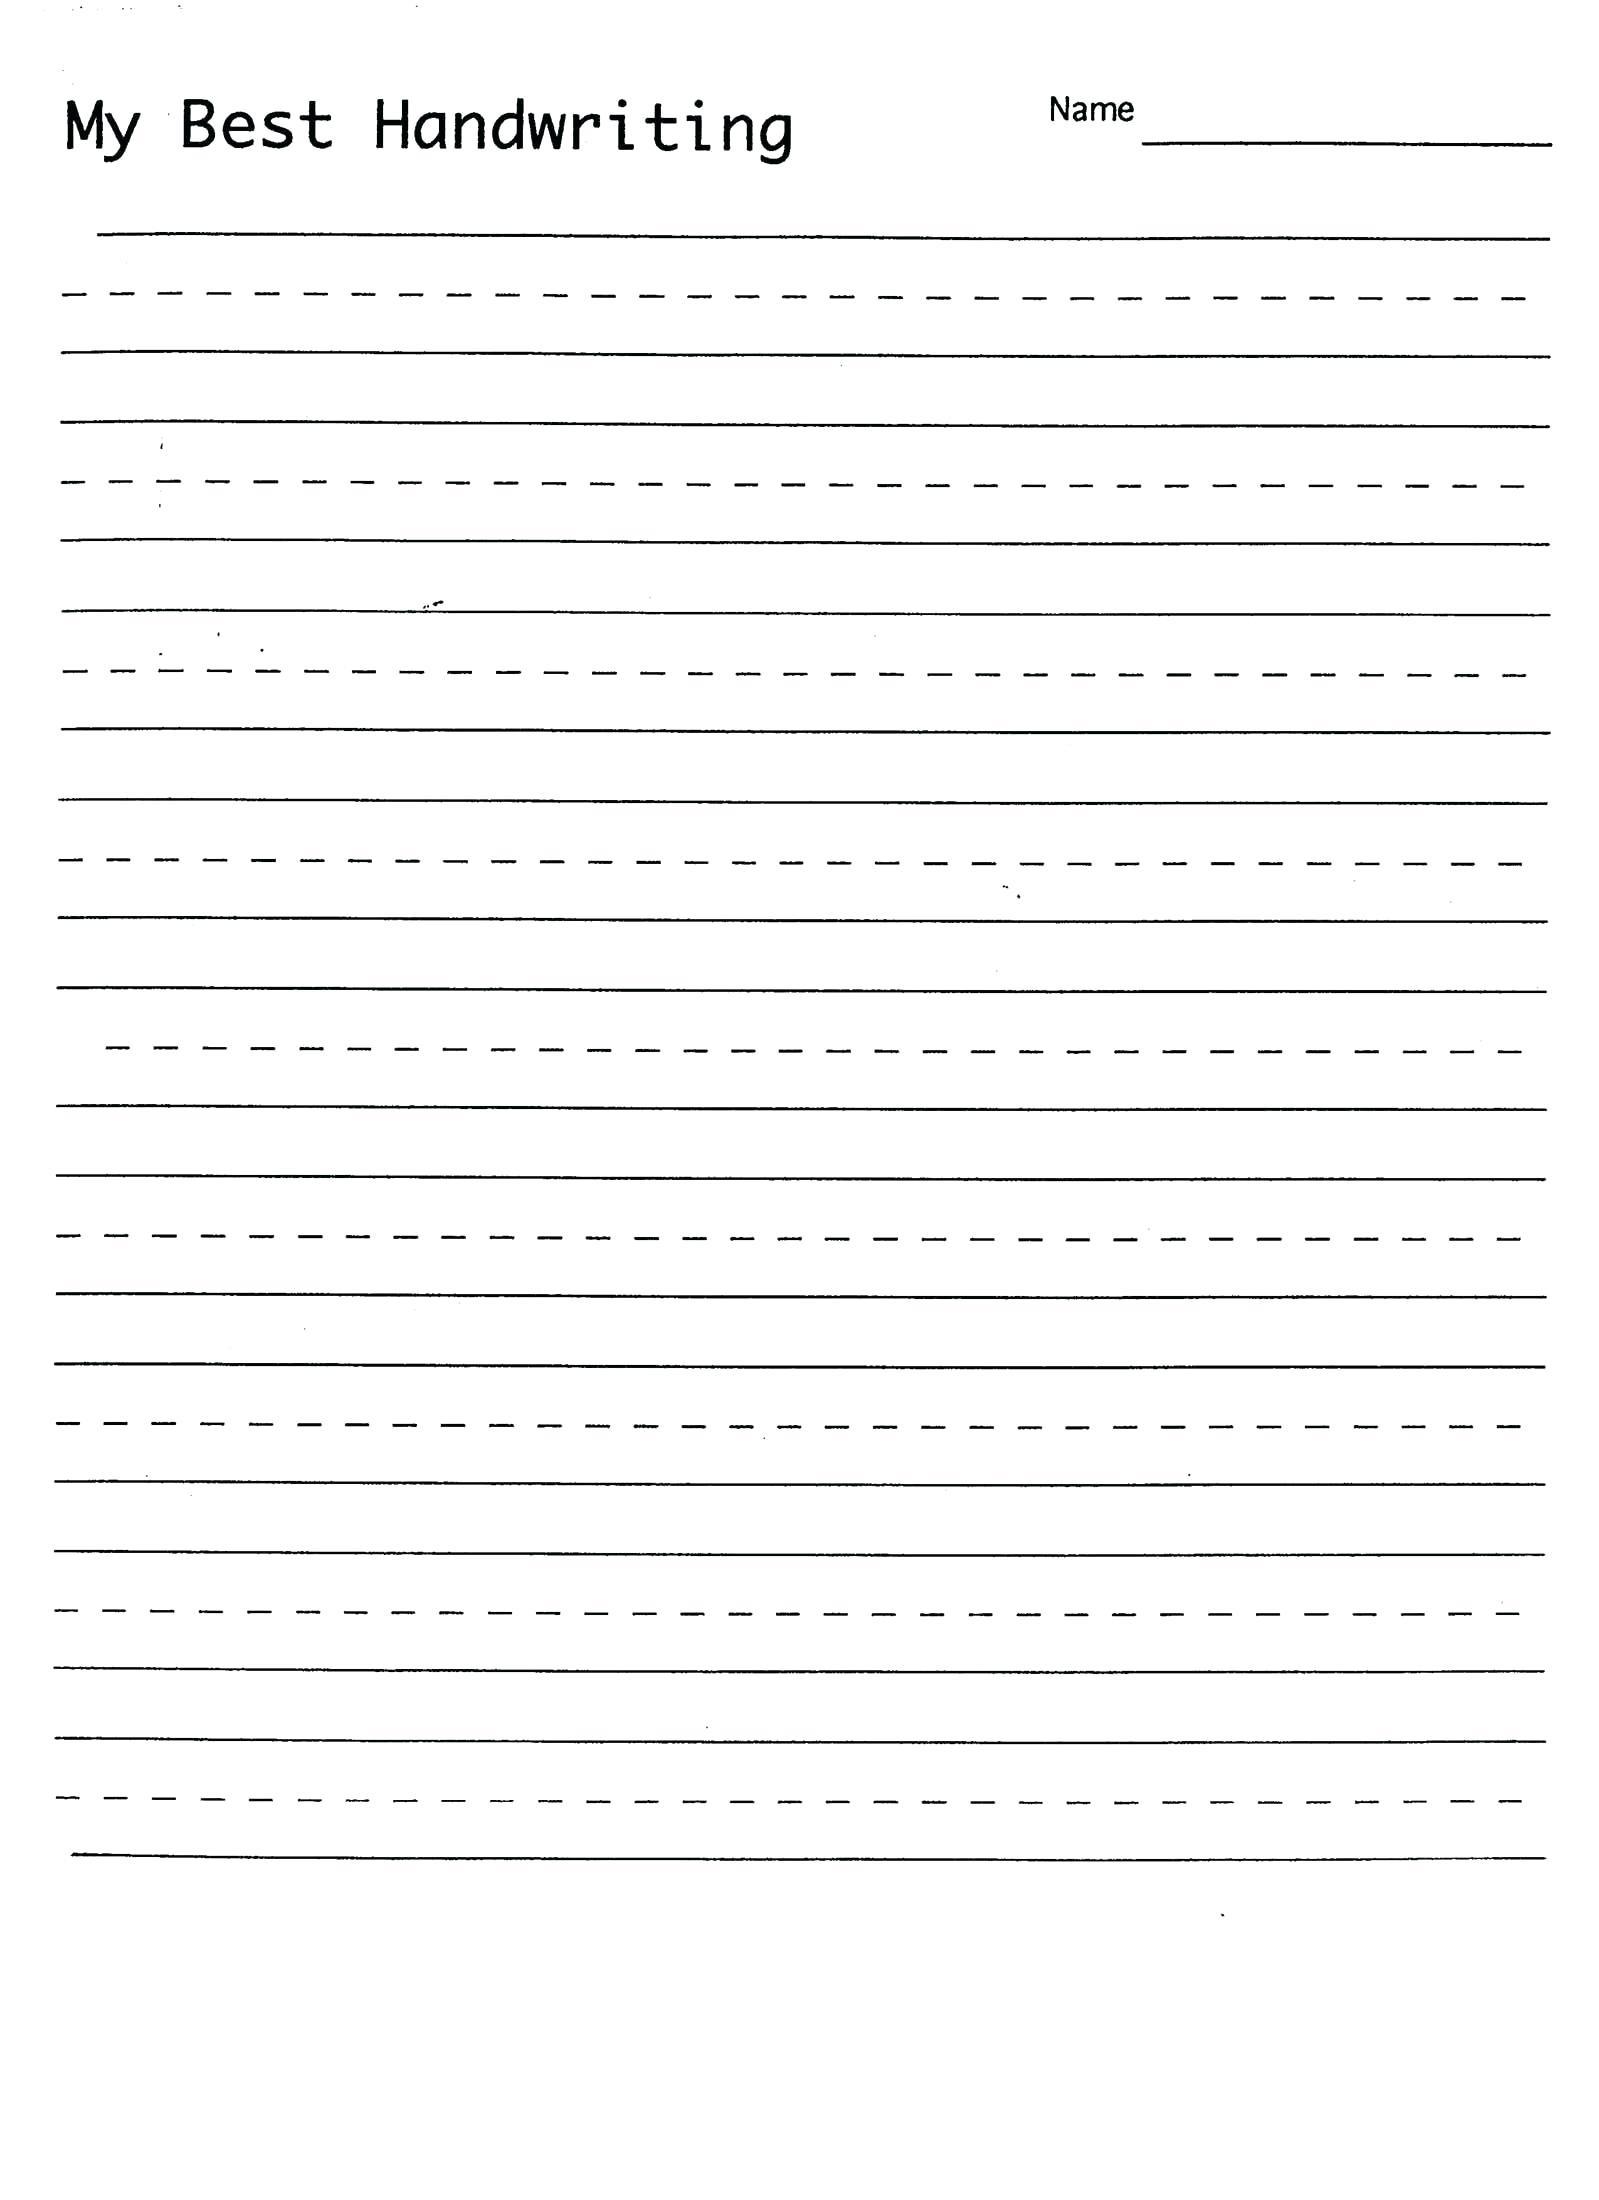 Free Cursive Sheets Writing Sheet Handwriting Free Alphabet - Free Printable Practice Name Writing Sheets